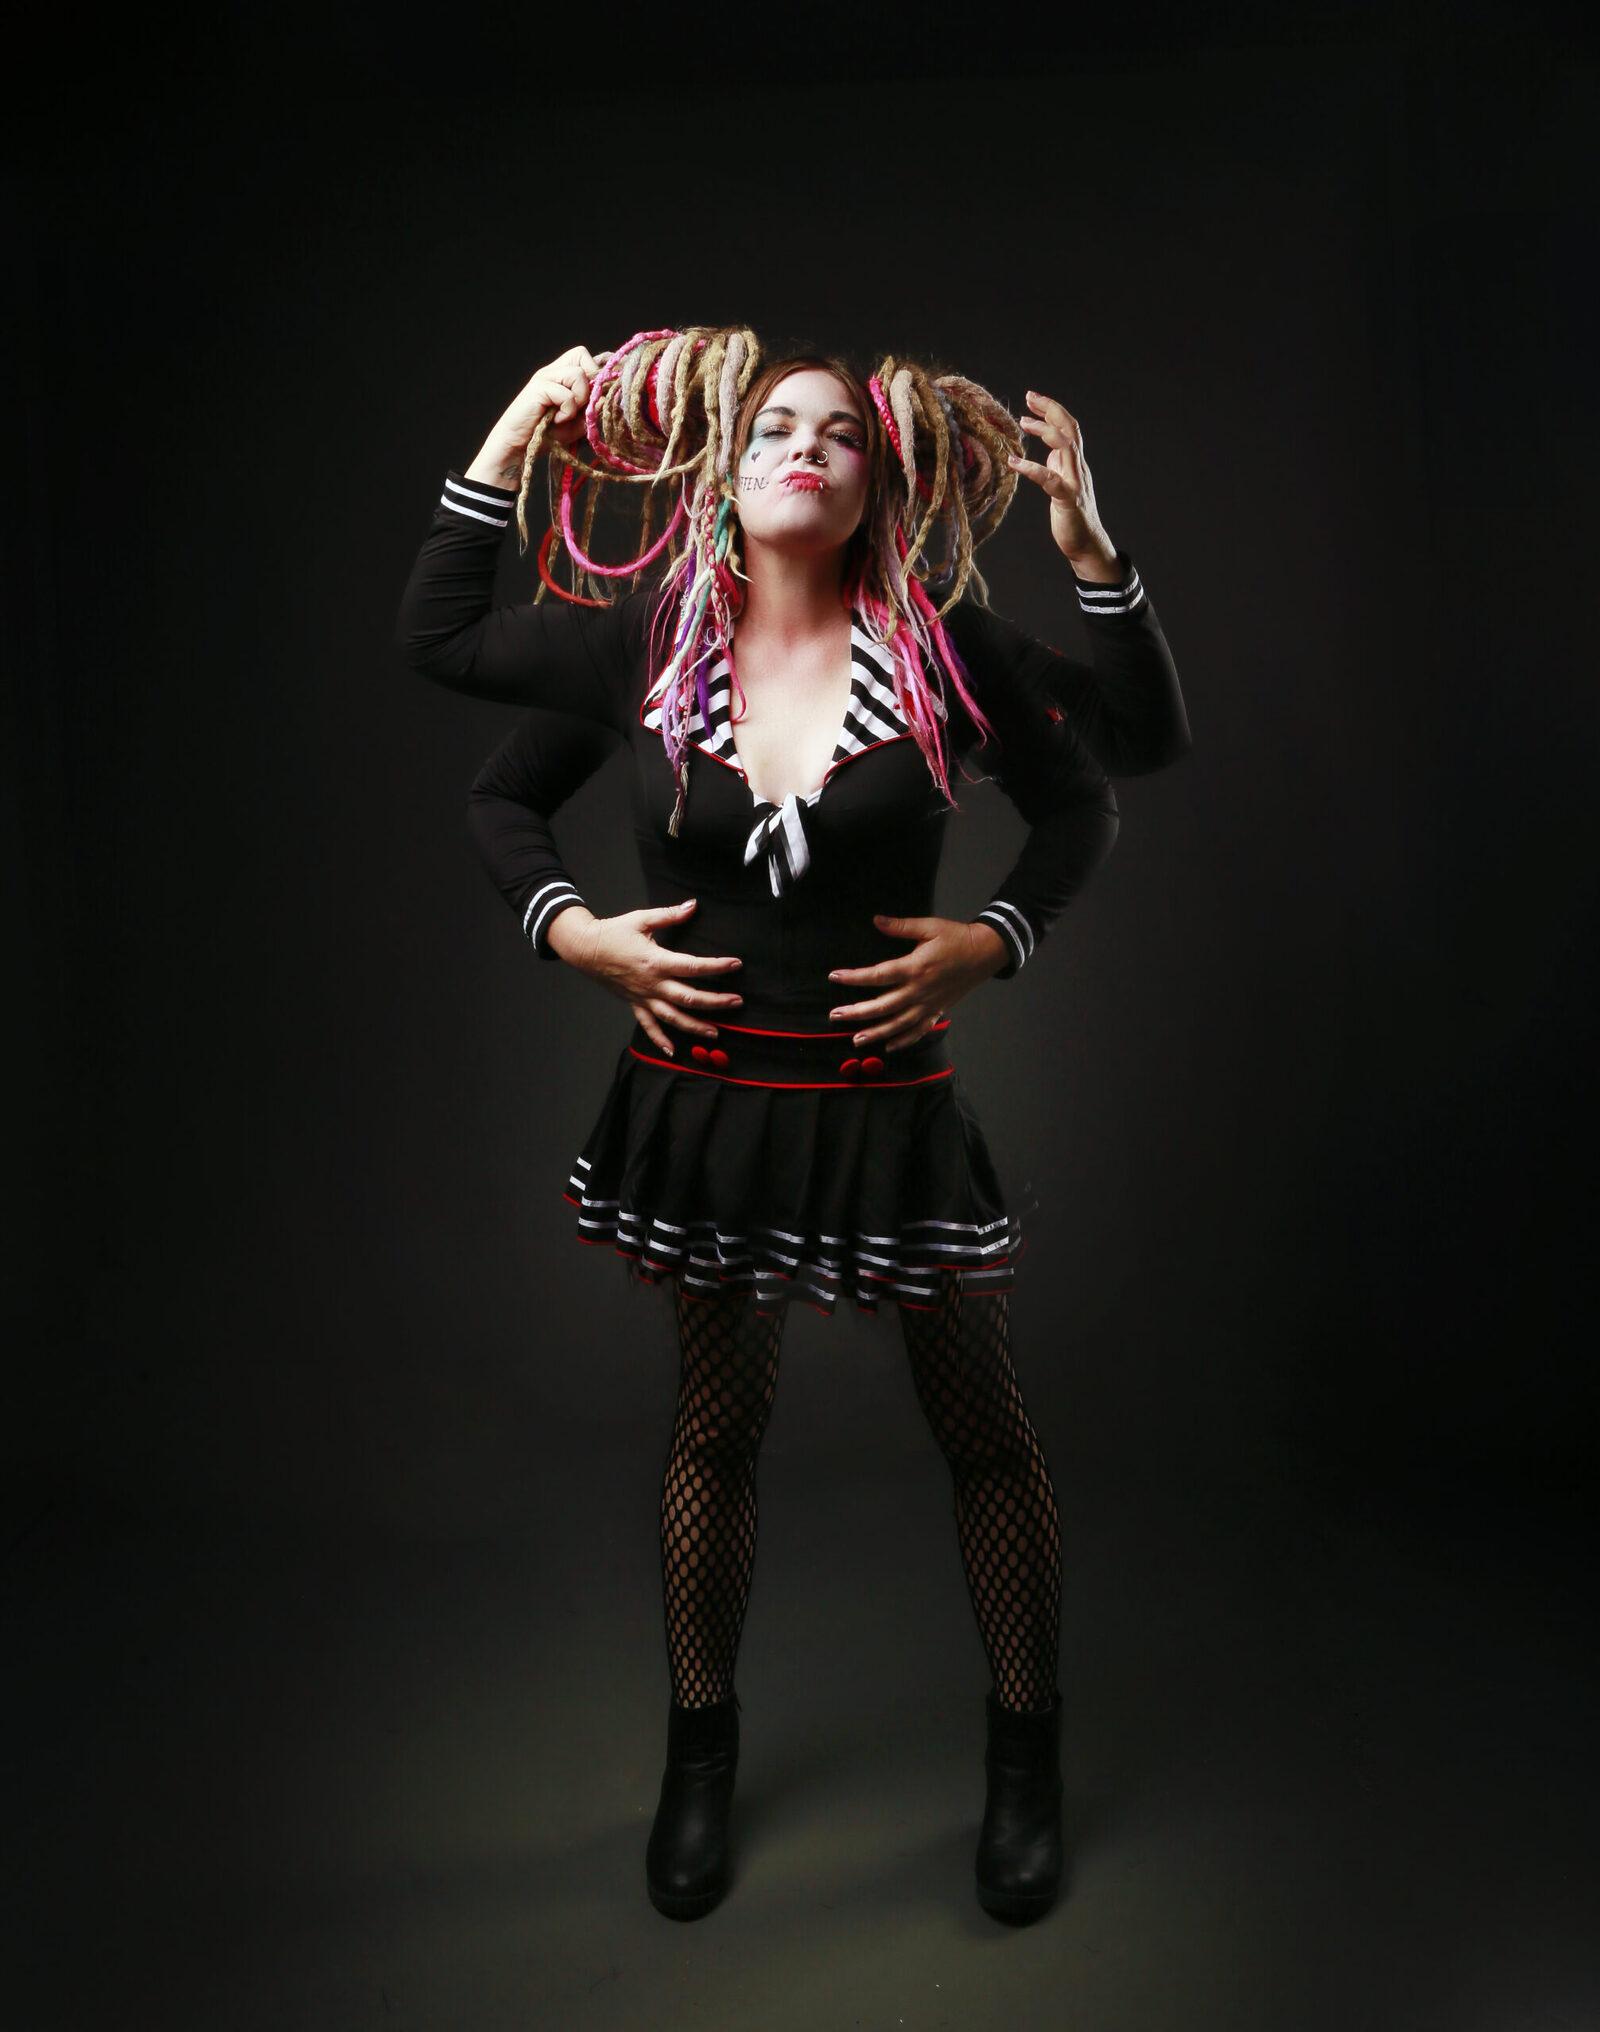 Harlequin photo shoot, Perth portrait photographer, Acid Rain